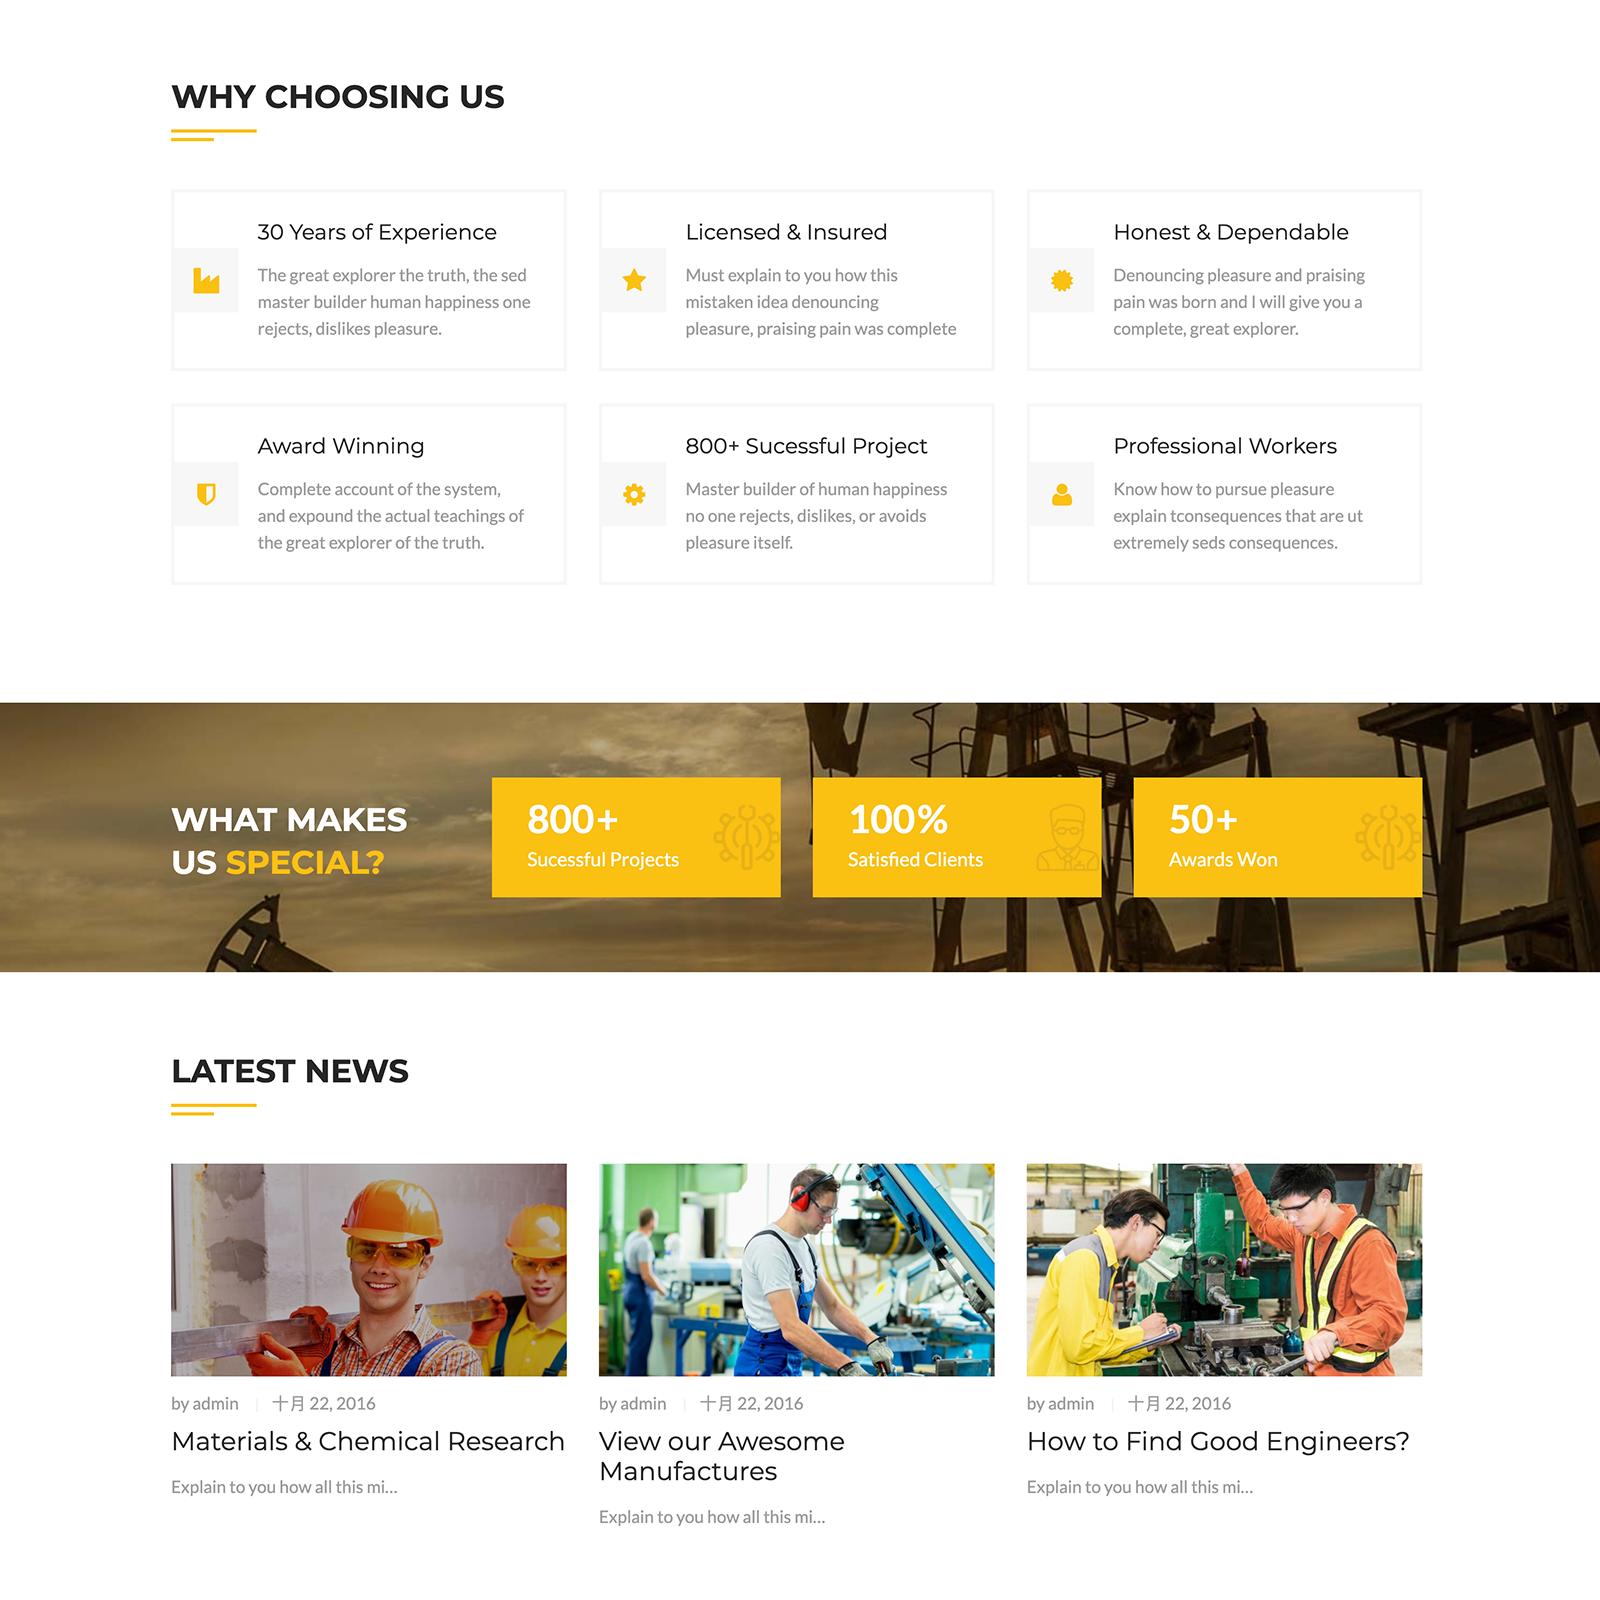 wordpress主题模板外贸公司工厂产品展示企业营销响应式网站建设